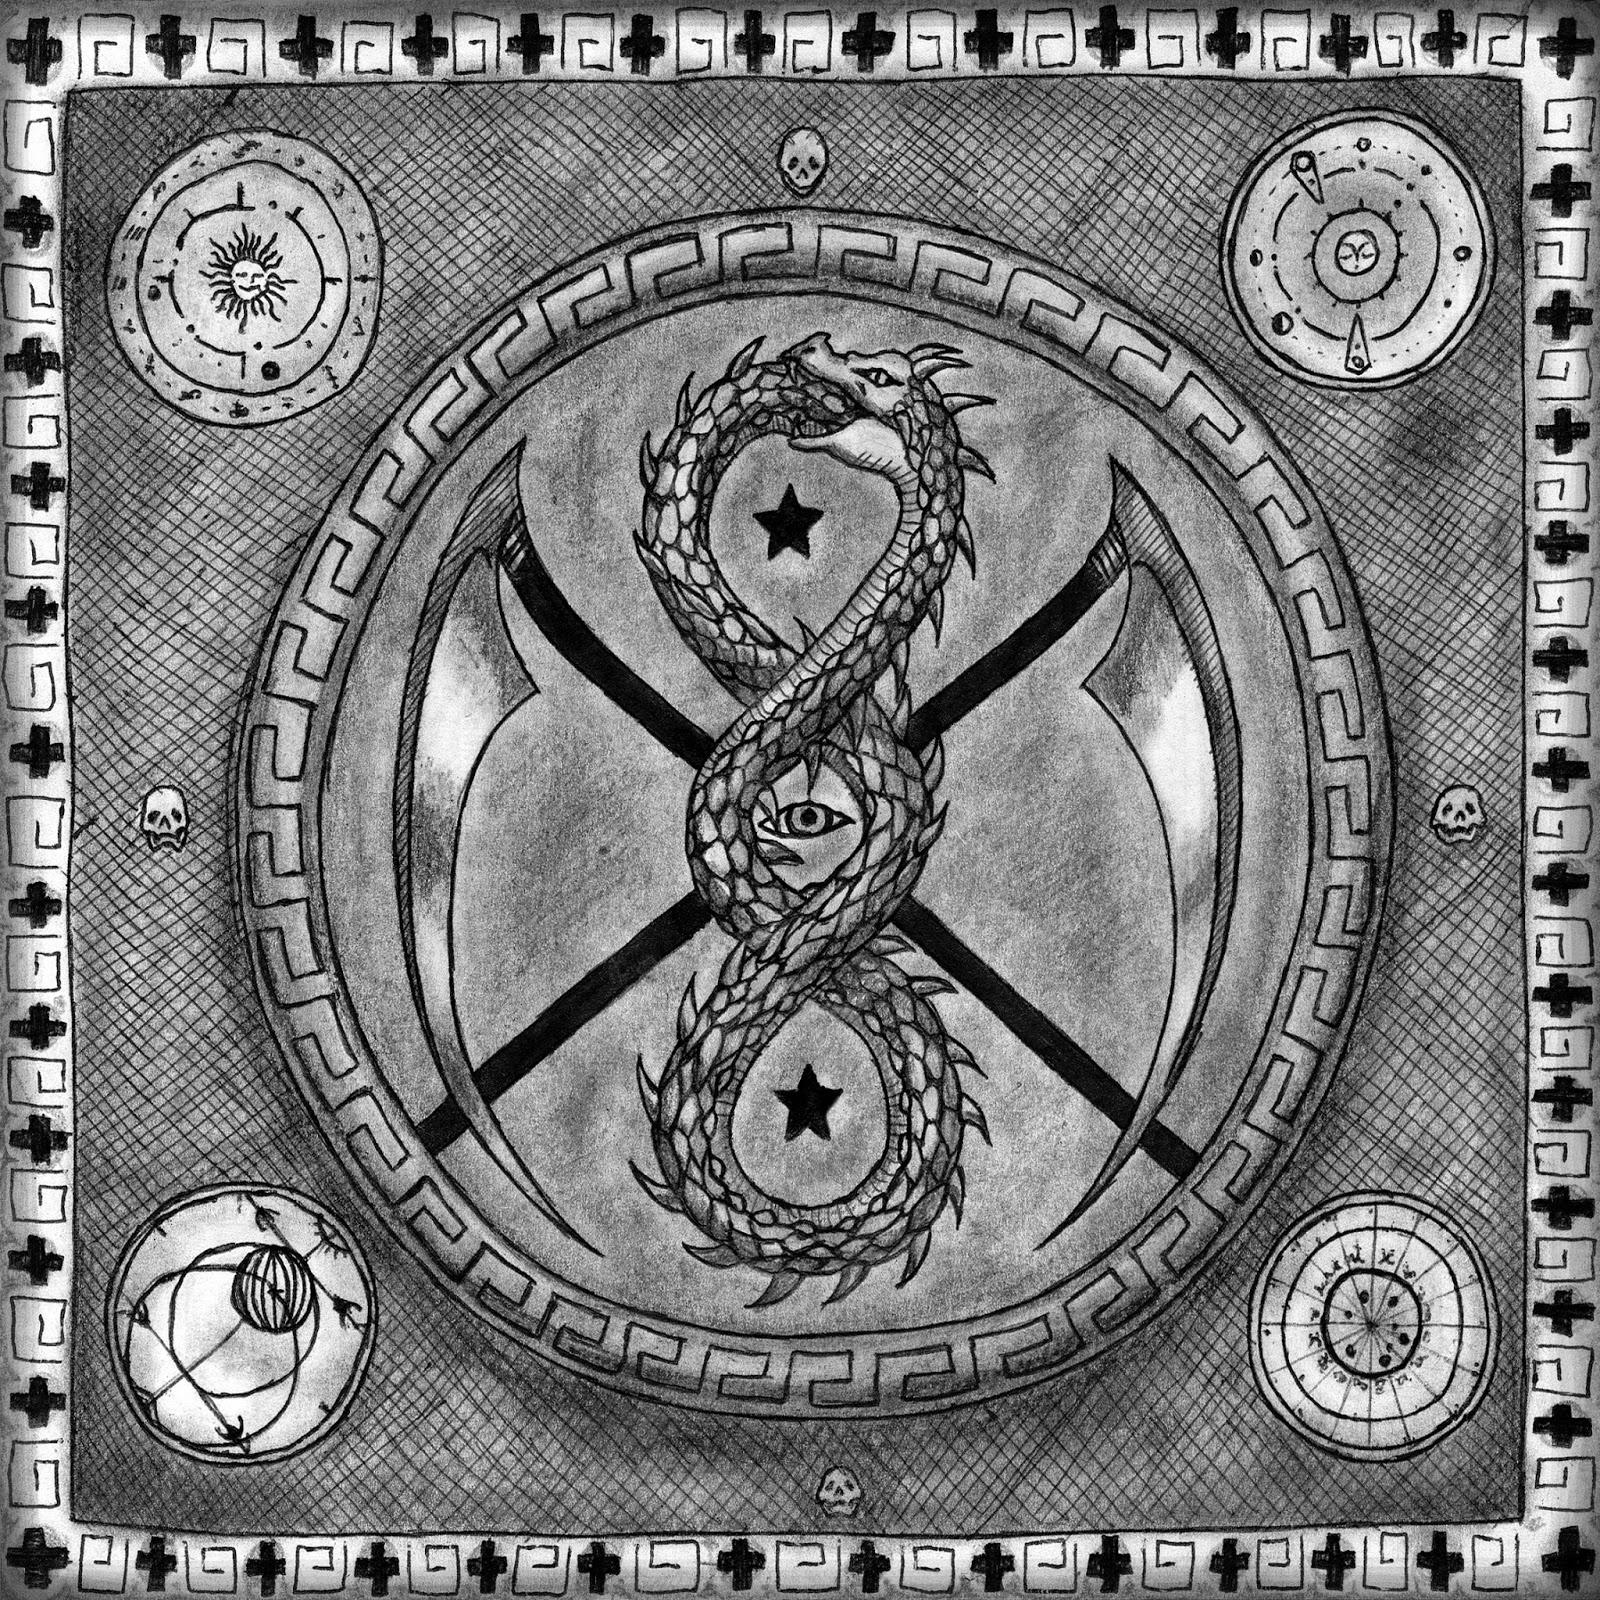 Corniger Calvariam - Ocultismo Contratapa